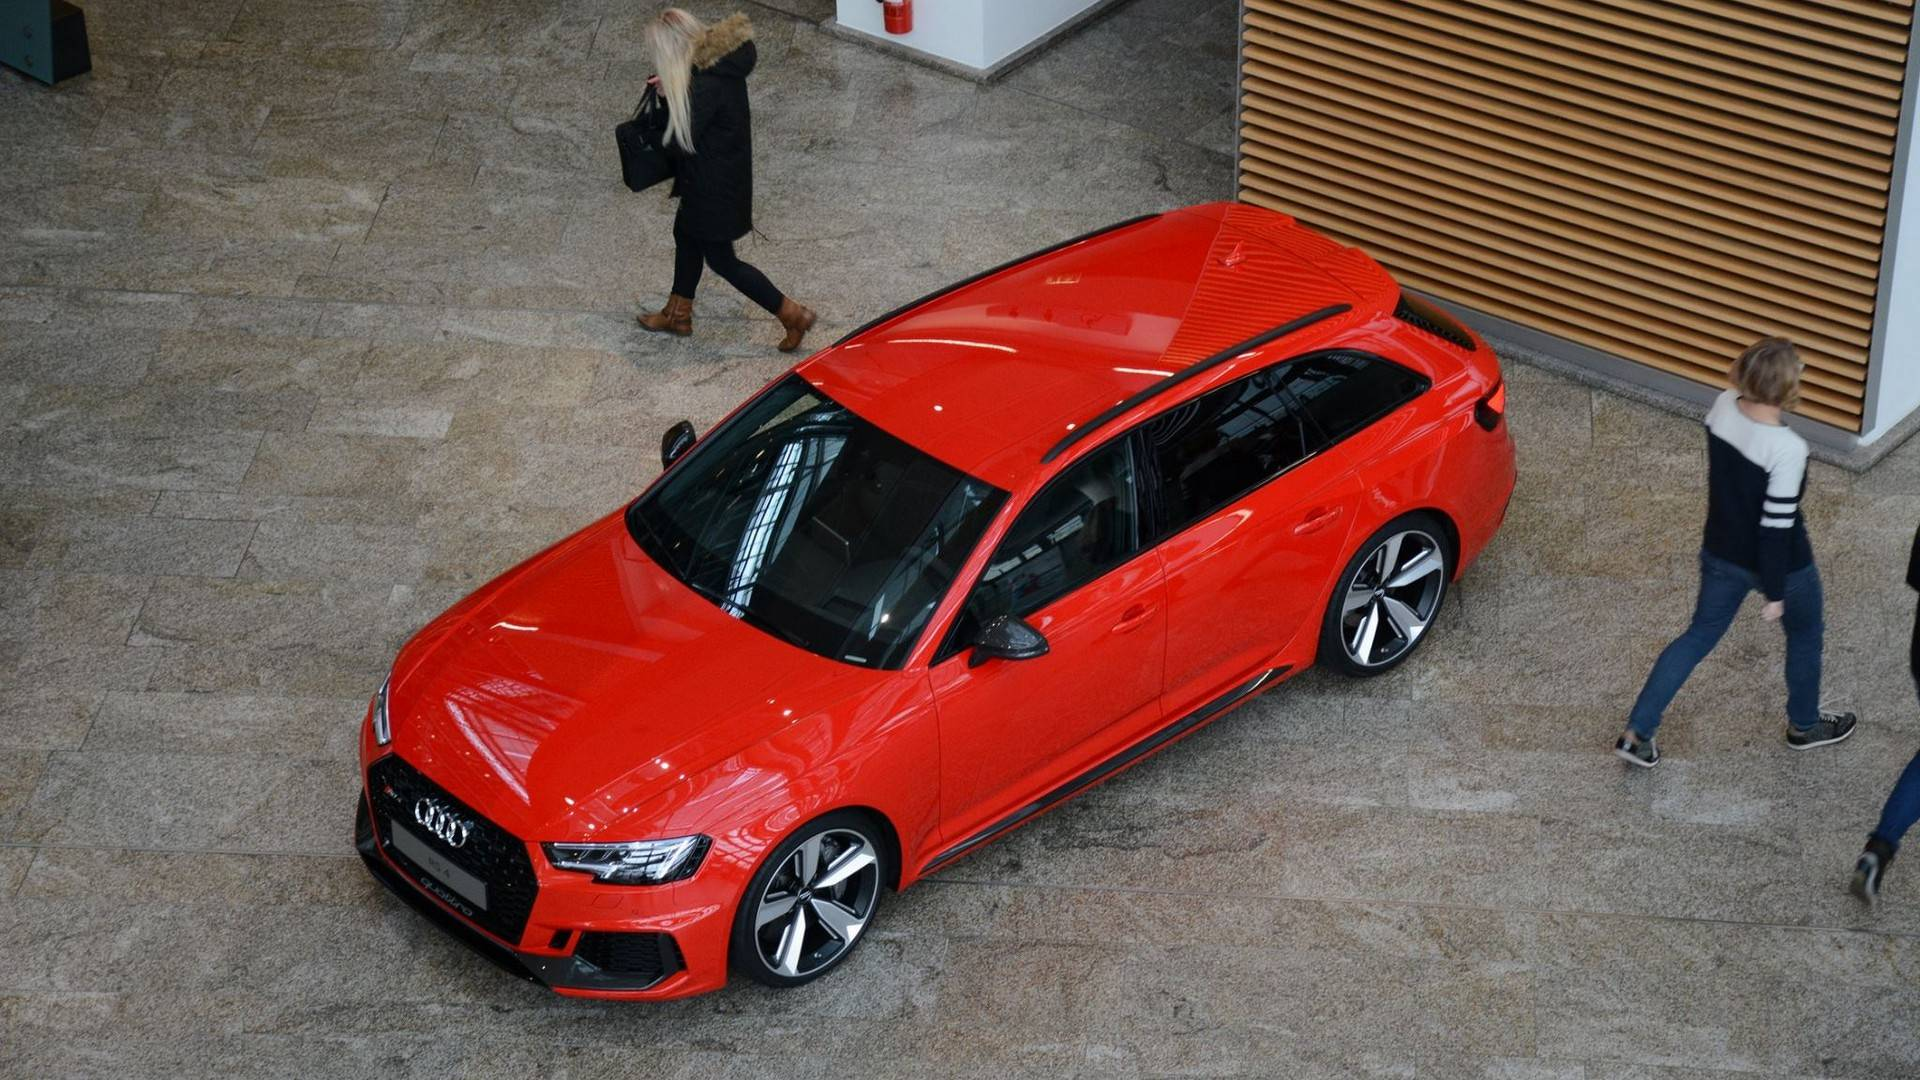 2018 audi rs4 avant misano red آئودی RS4 آوانت ۲۰۱۸ رونمایی شد   اجاره ماشین